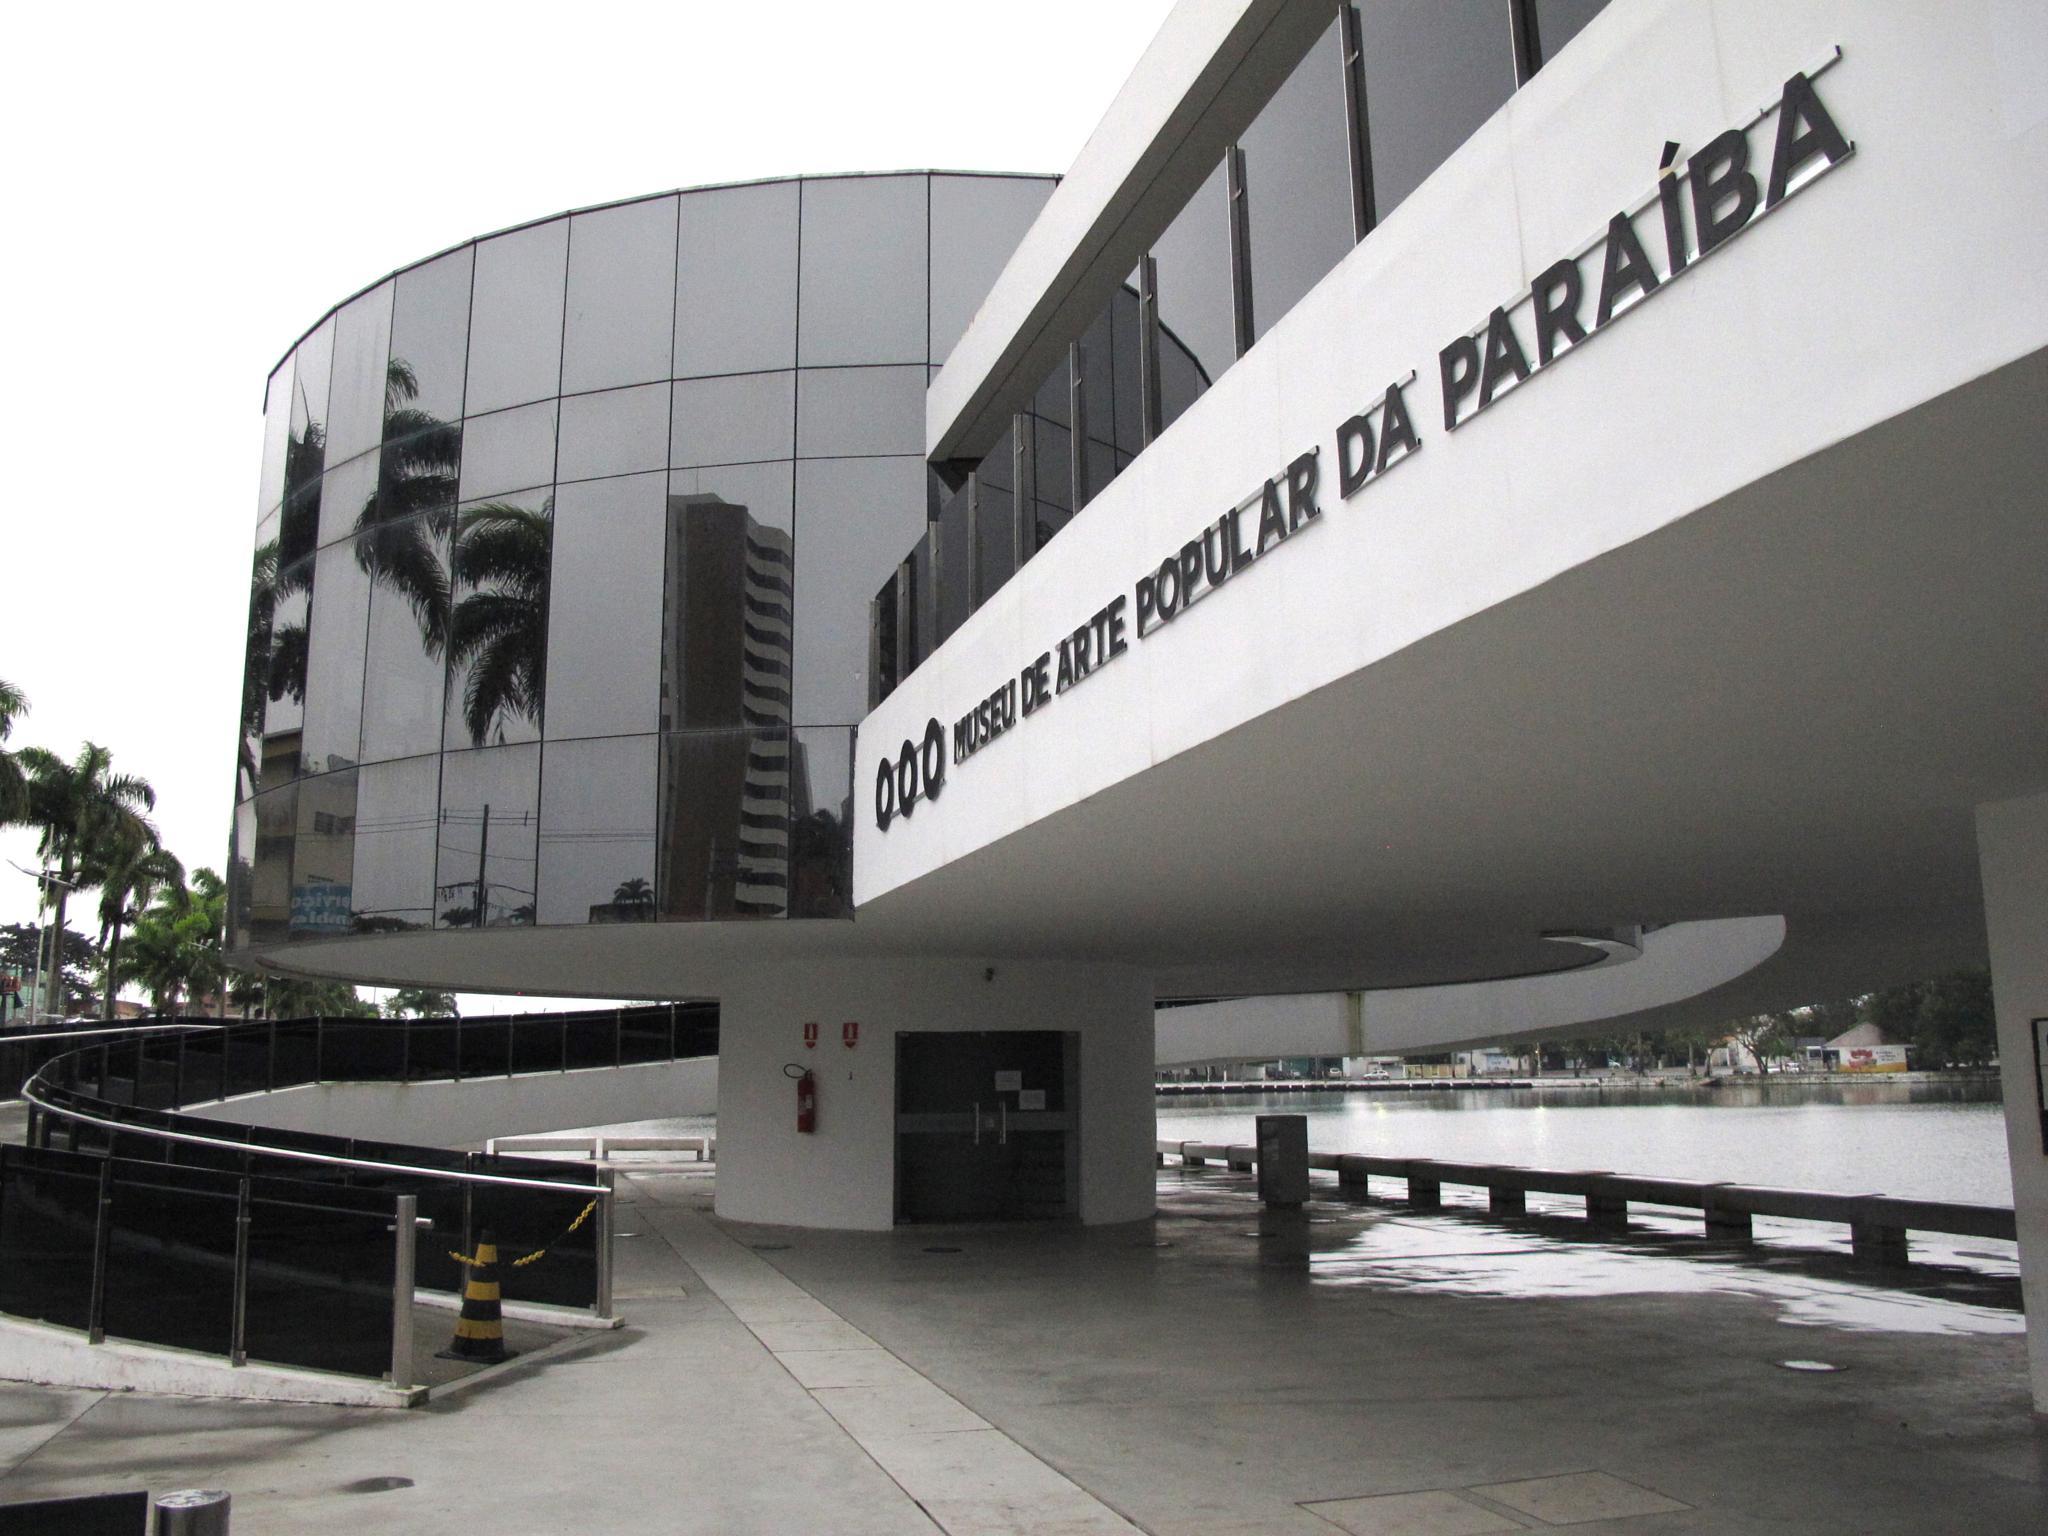 Art museum Paraiba by edielson.rocha.94